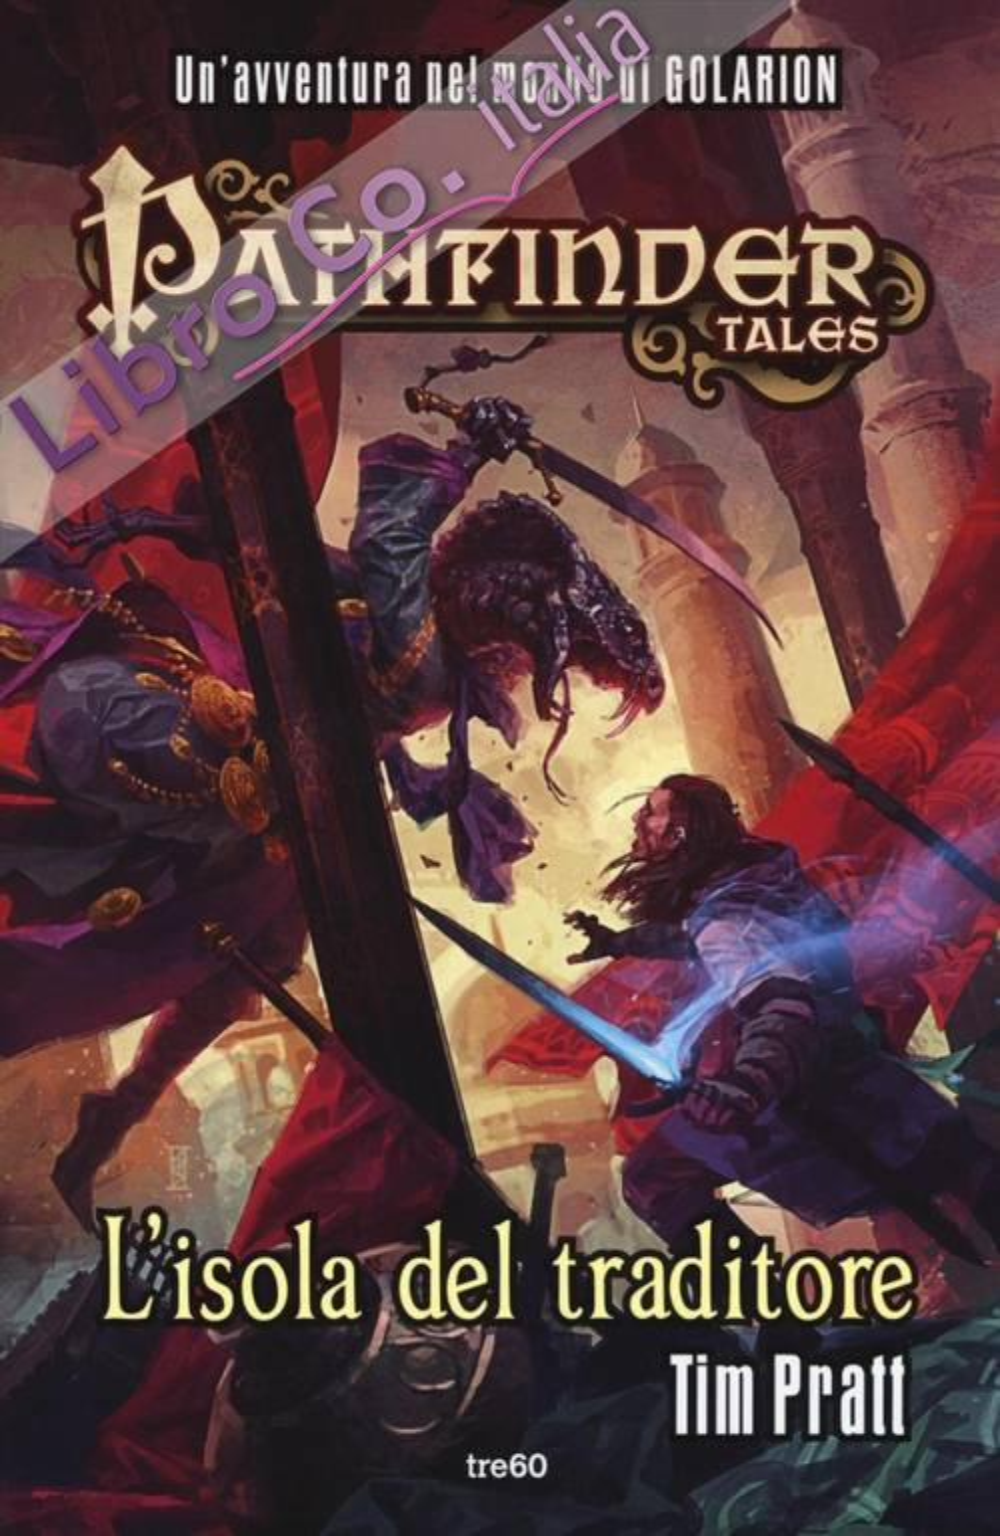 L'isola del traditore. Pathfinder Tales